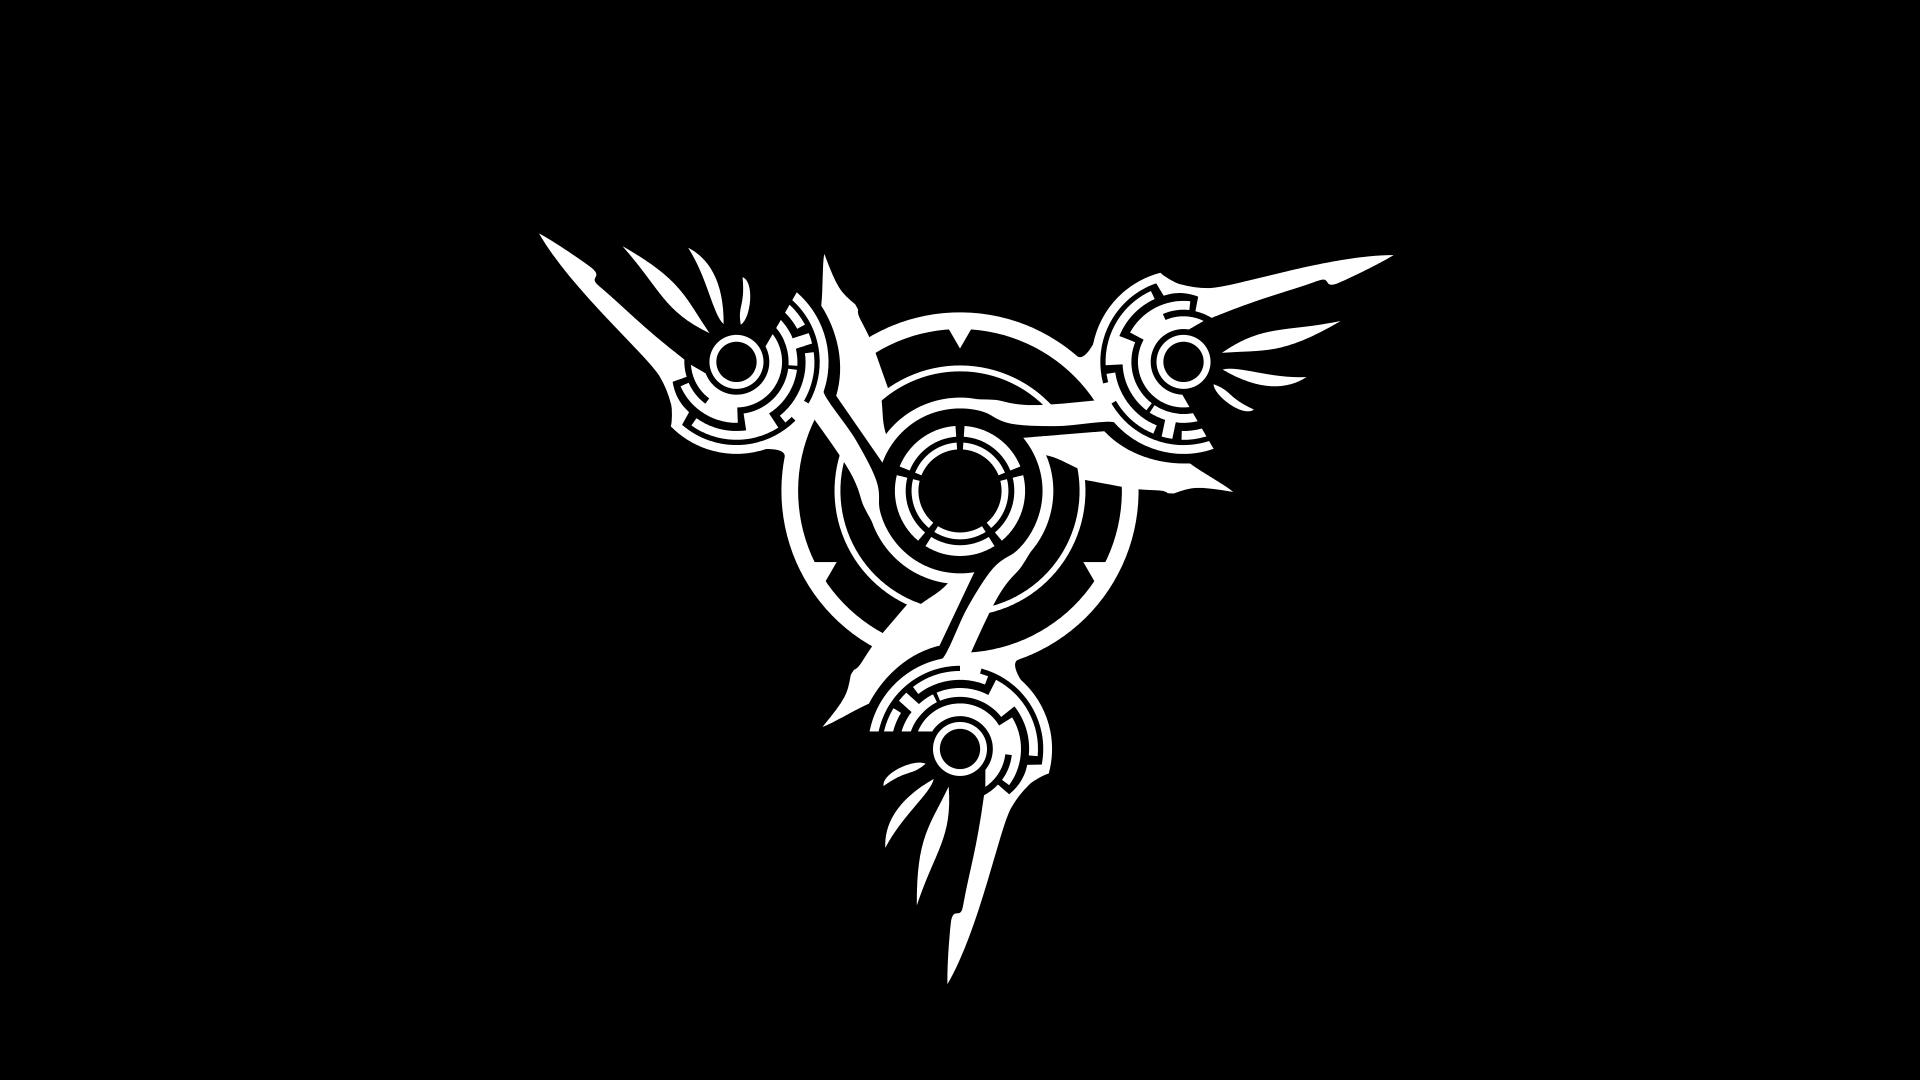 Cool Symbol Logos & Symbols Pinterest Symbols and Logos